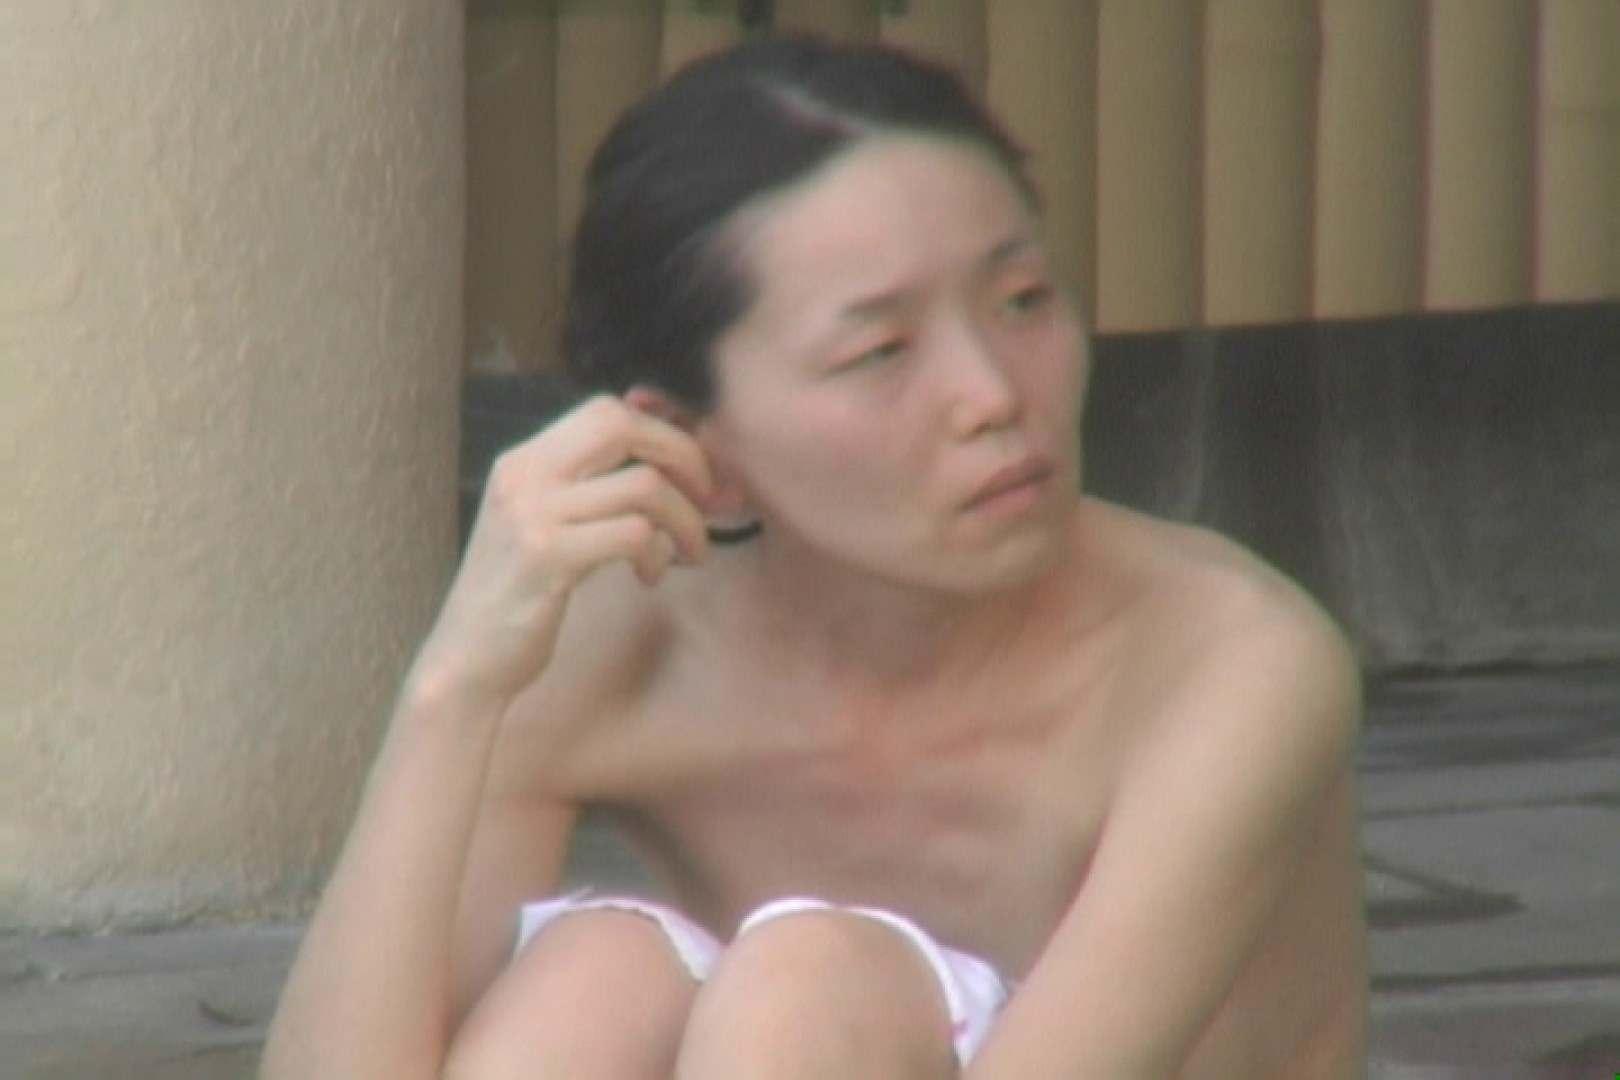 Aquaな露天風呂Vol.577 0 | 0  51連発 27